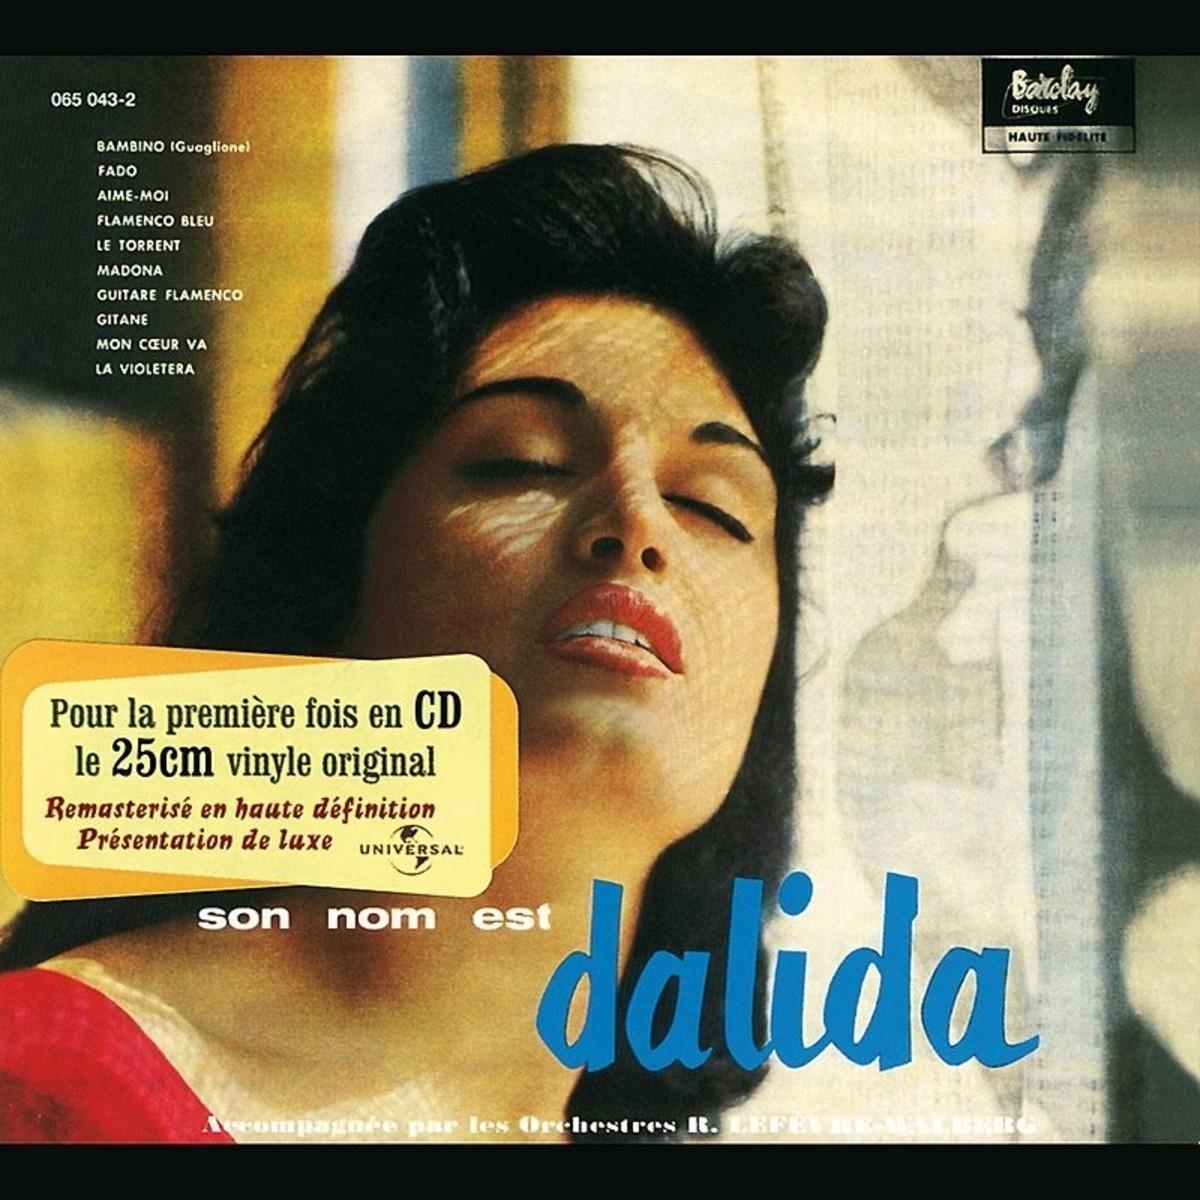 BAMBINO MP3 TÉLÉCHARGER DALIDA